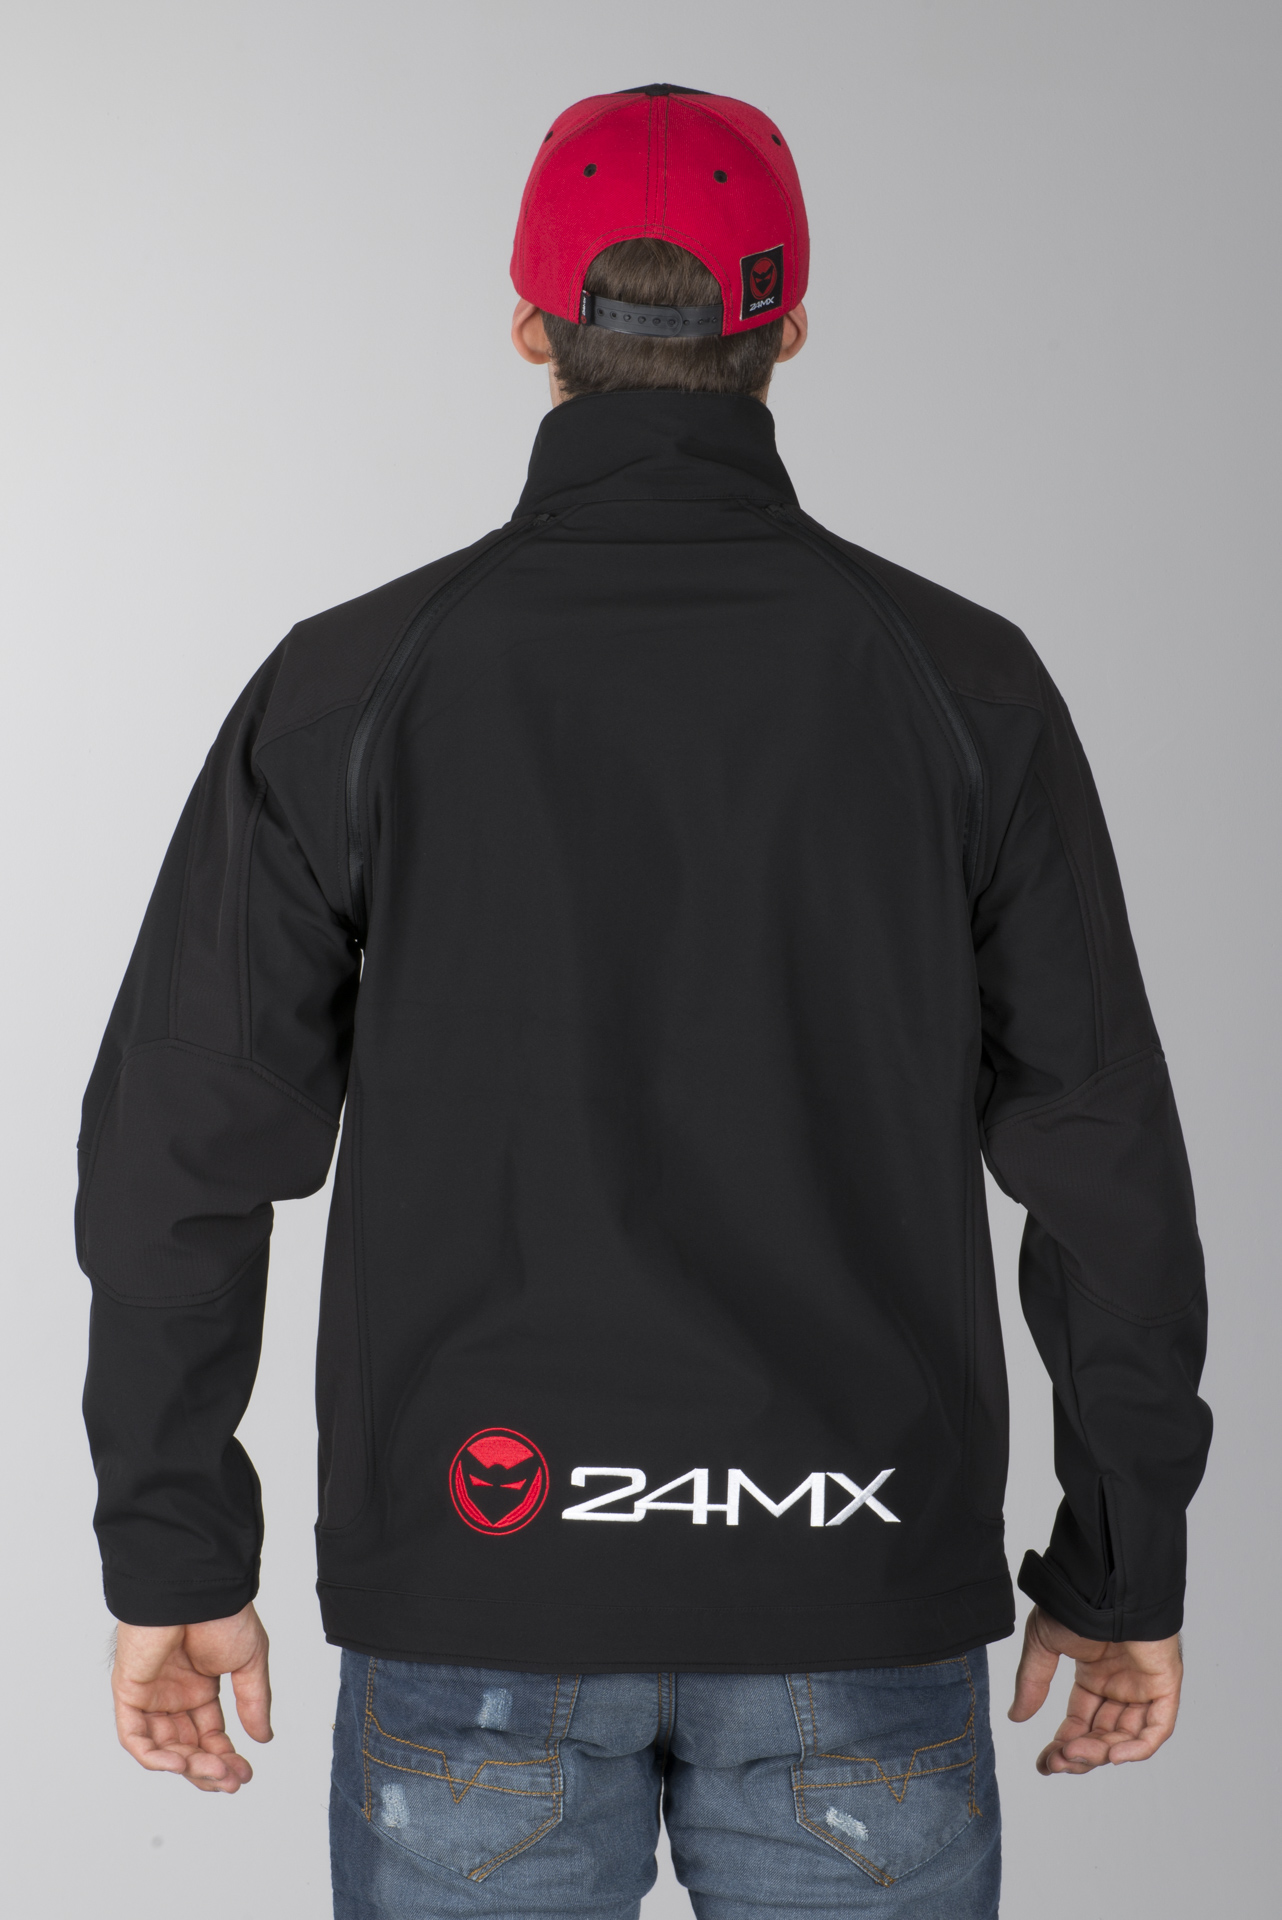 Paketti Tuulitakki 24MX + Softshell takki 24MX Team